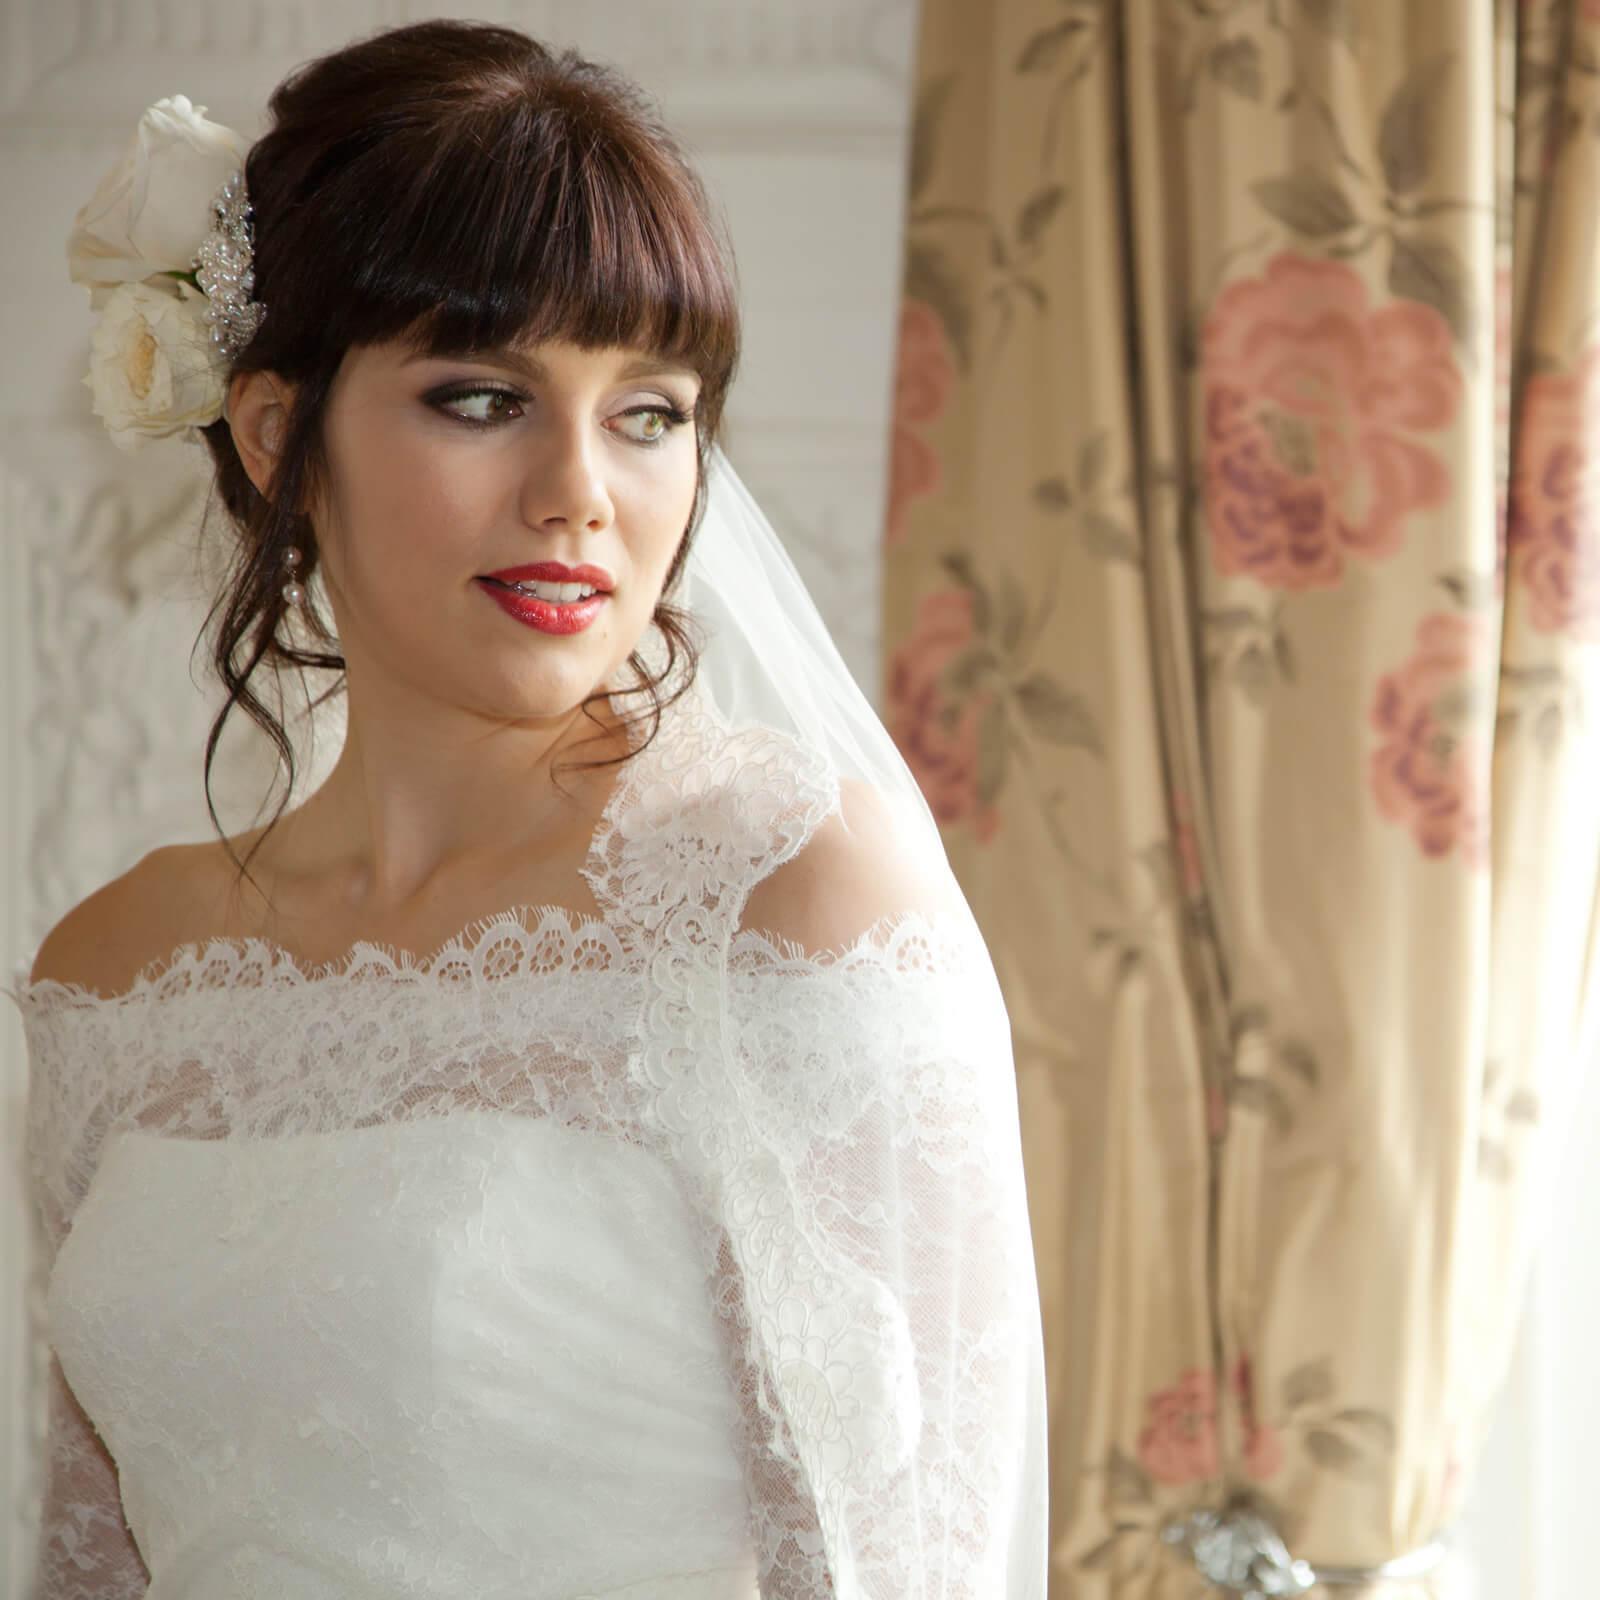 Warwickshire-wedding-photographer-Ettington-4